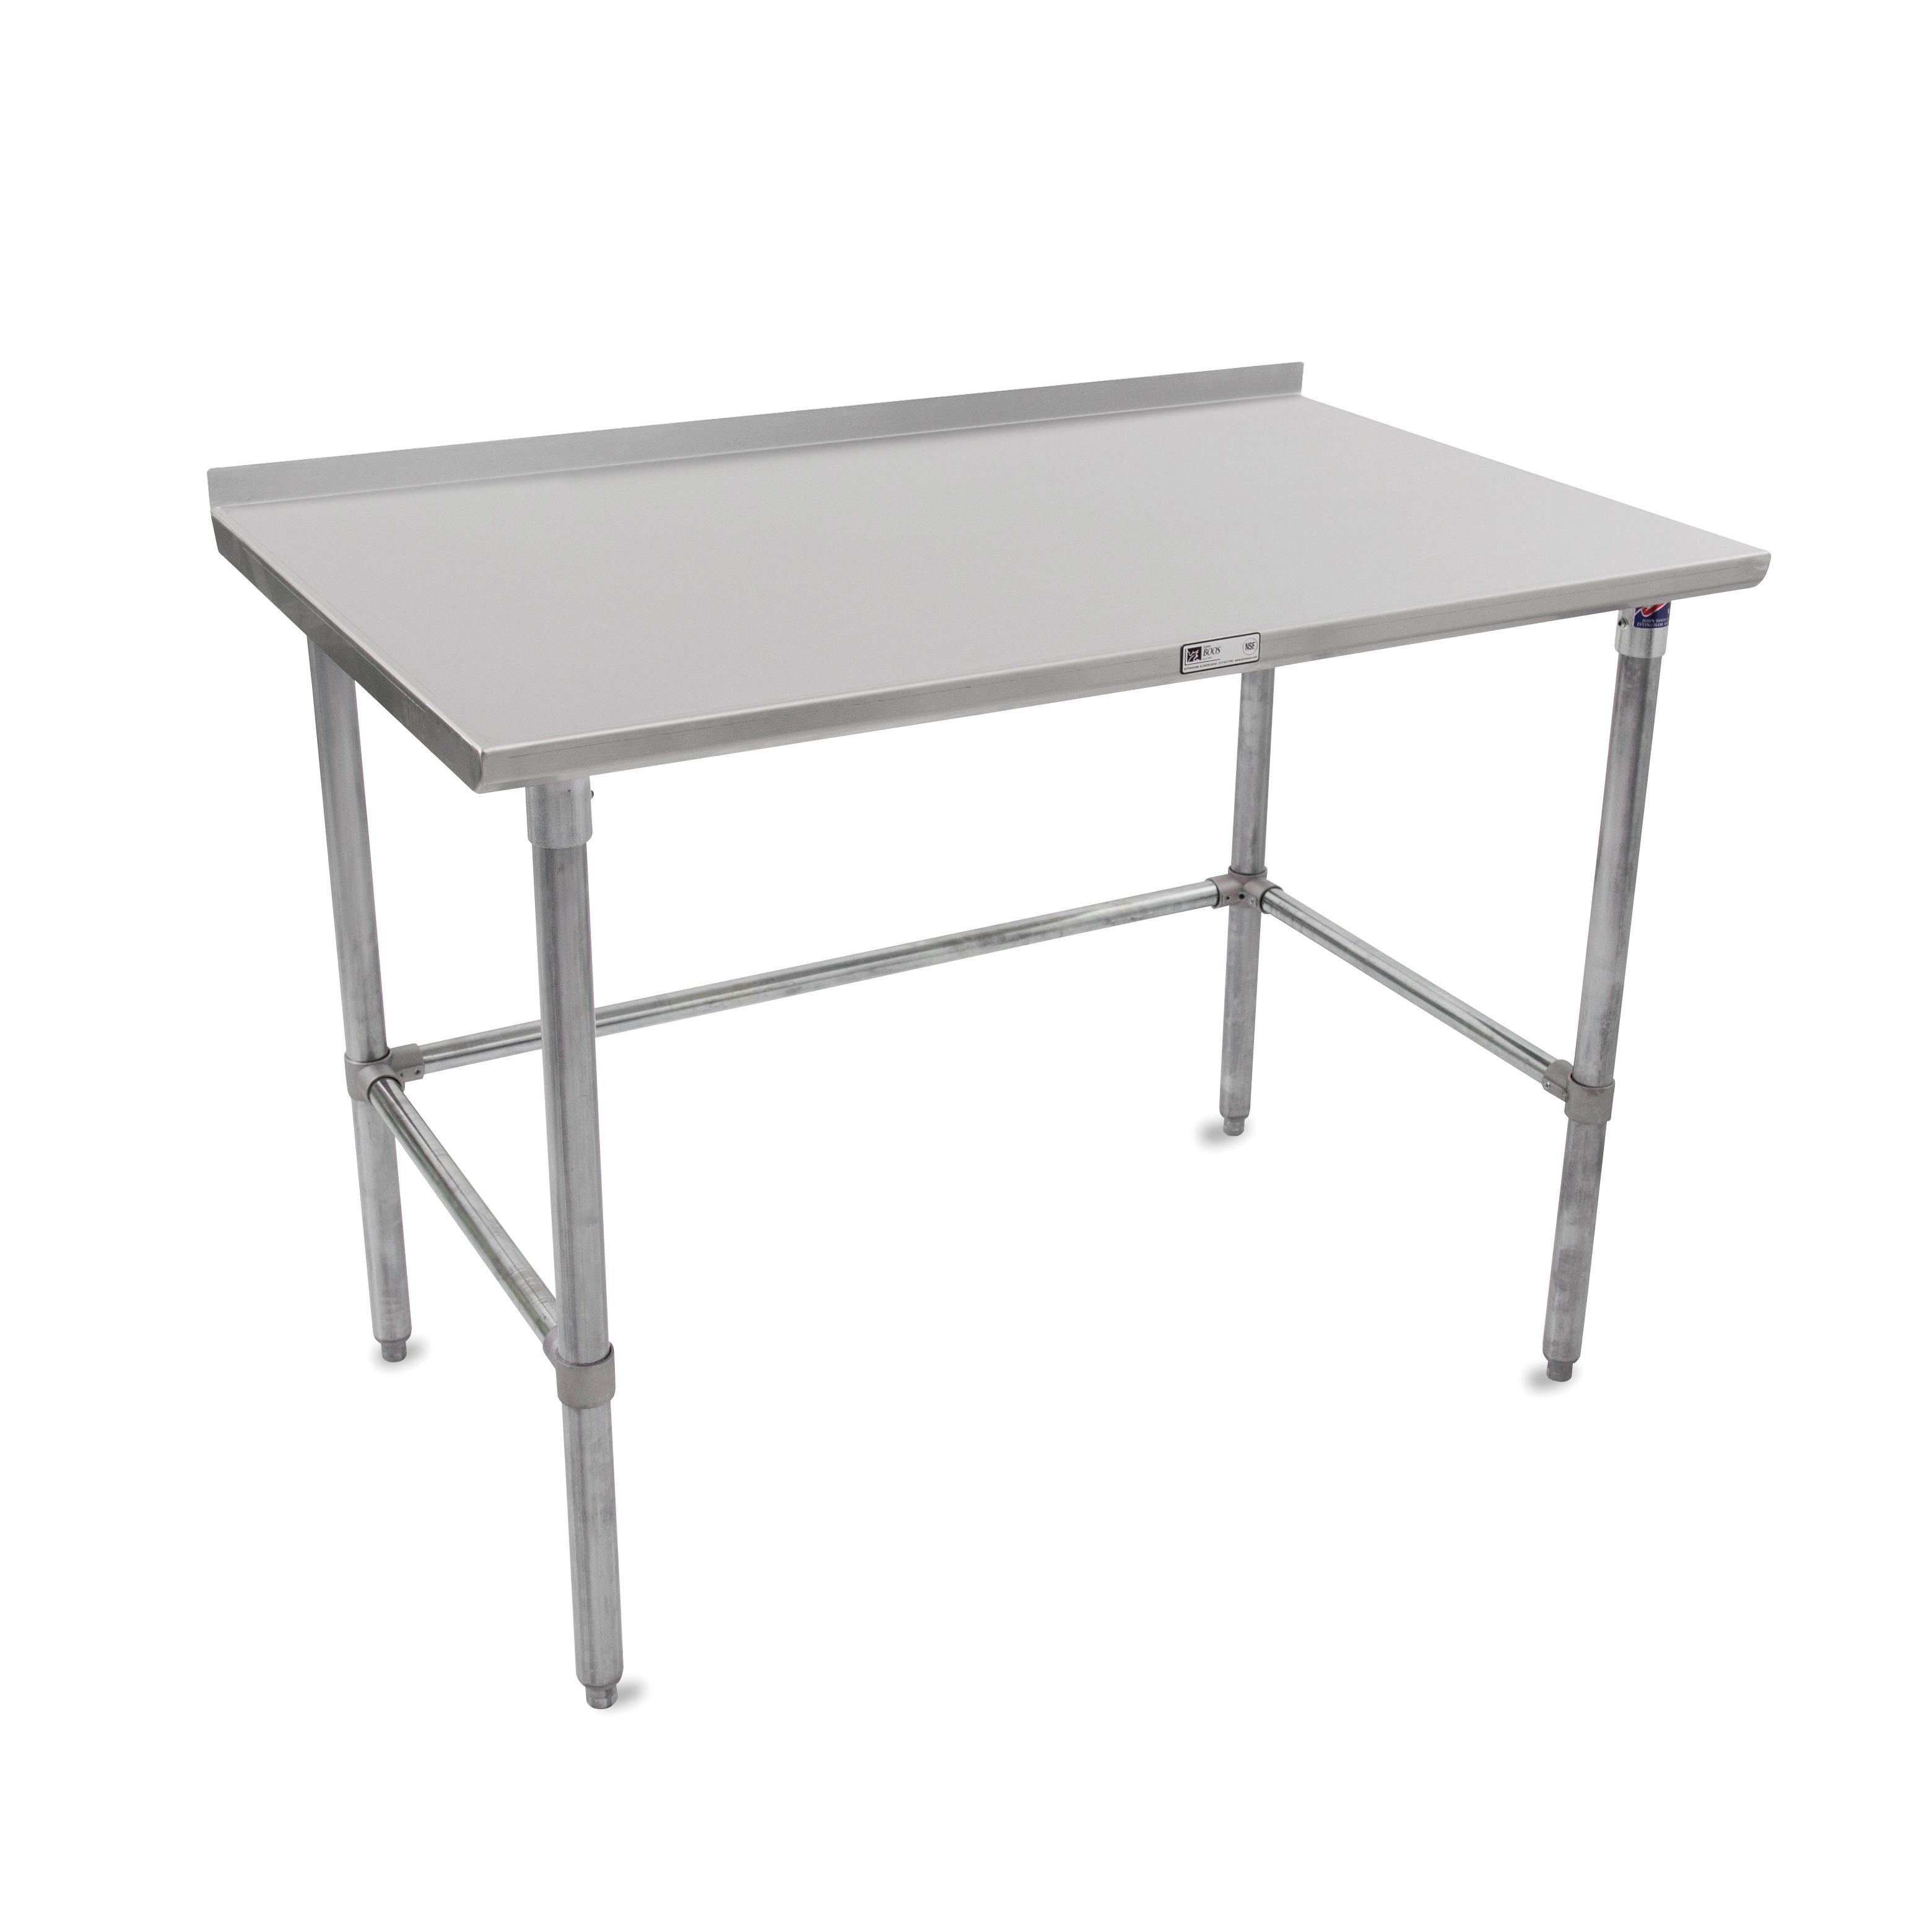 John Boos ST6R1.5-3630GBK work table,  30